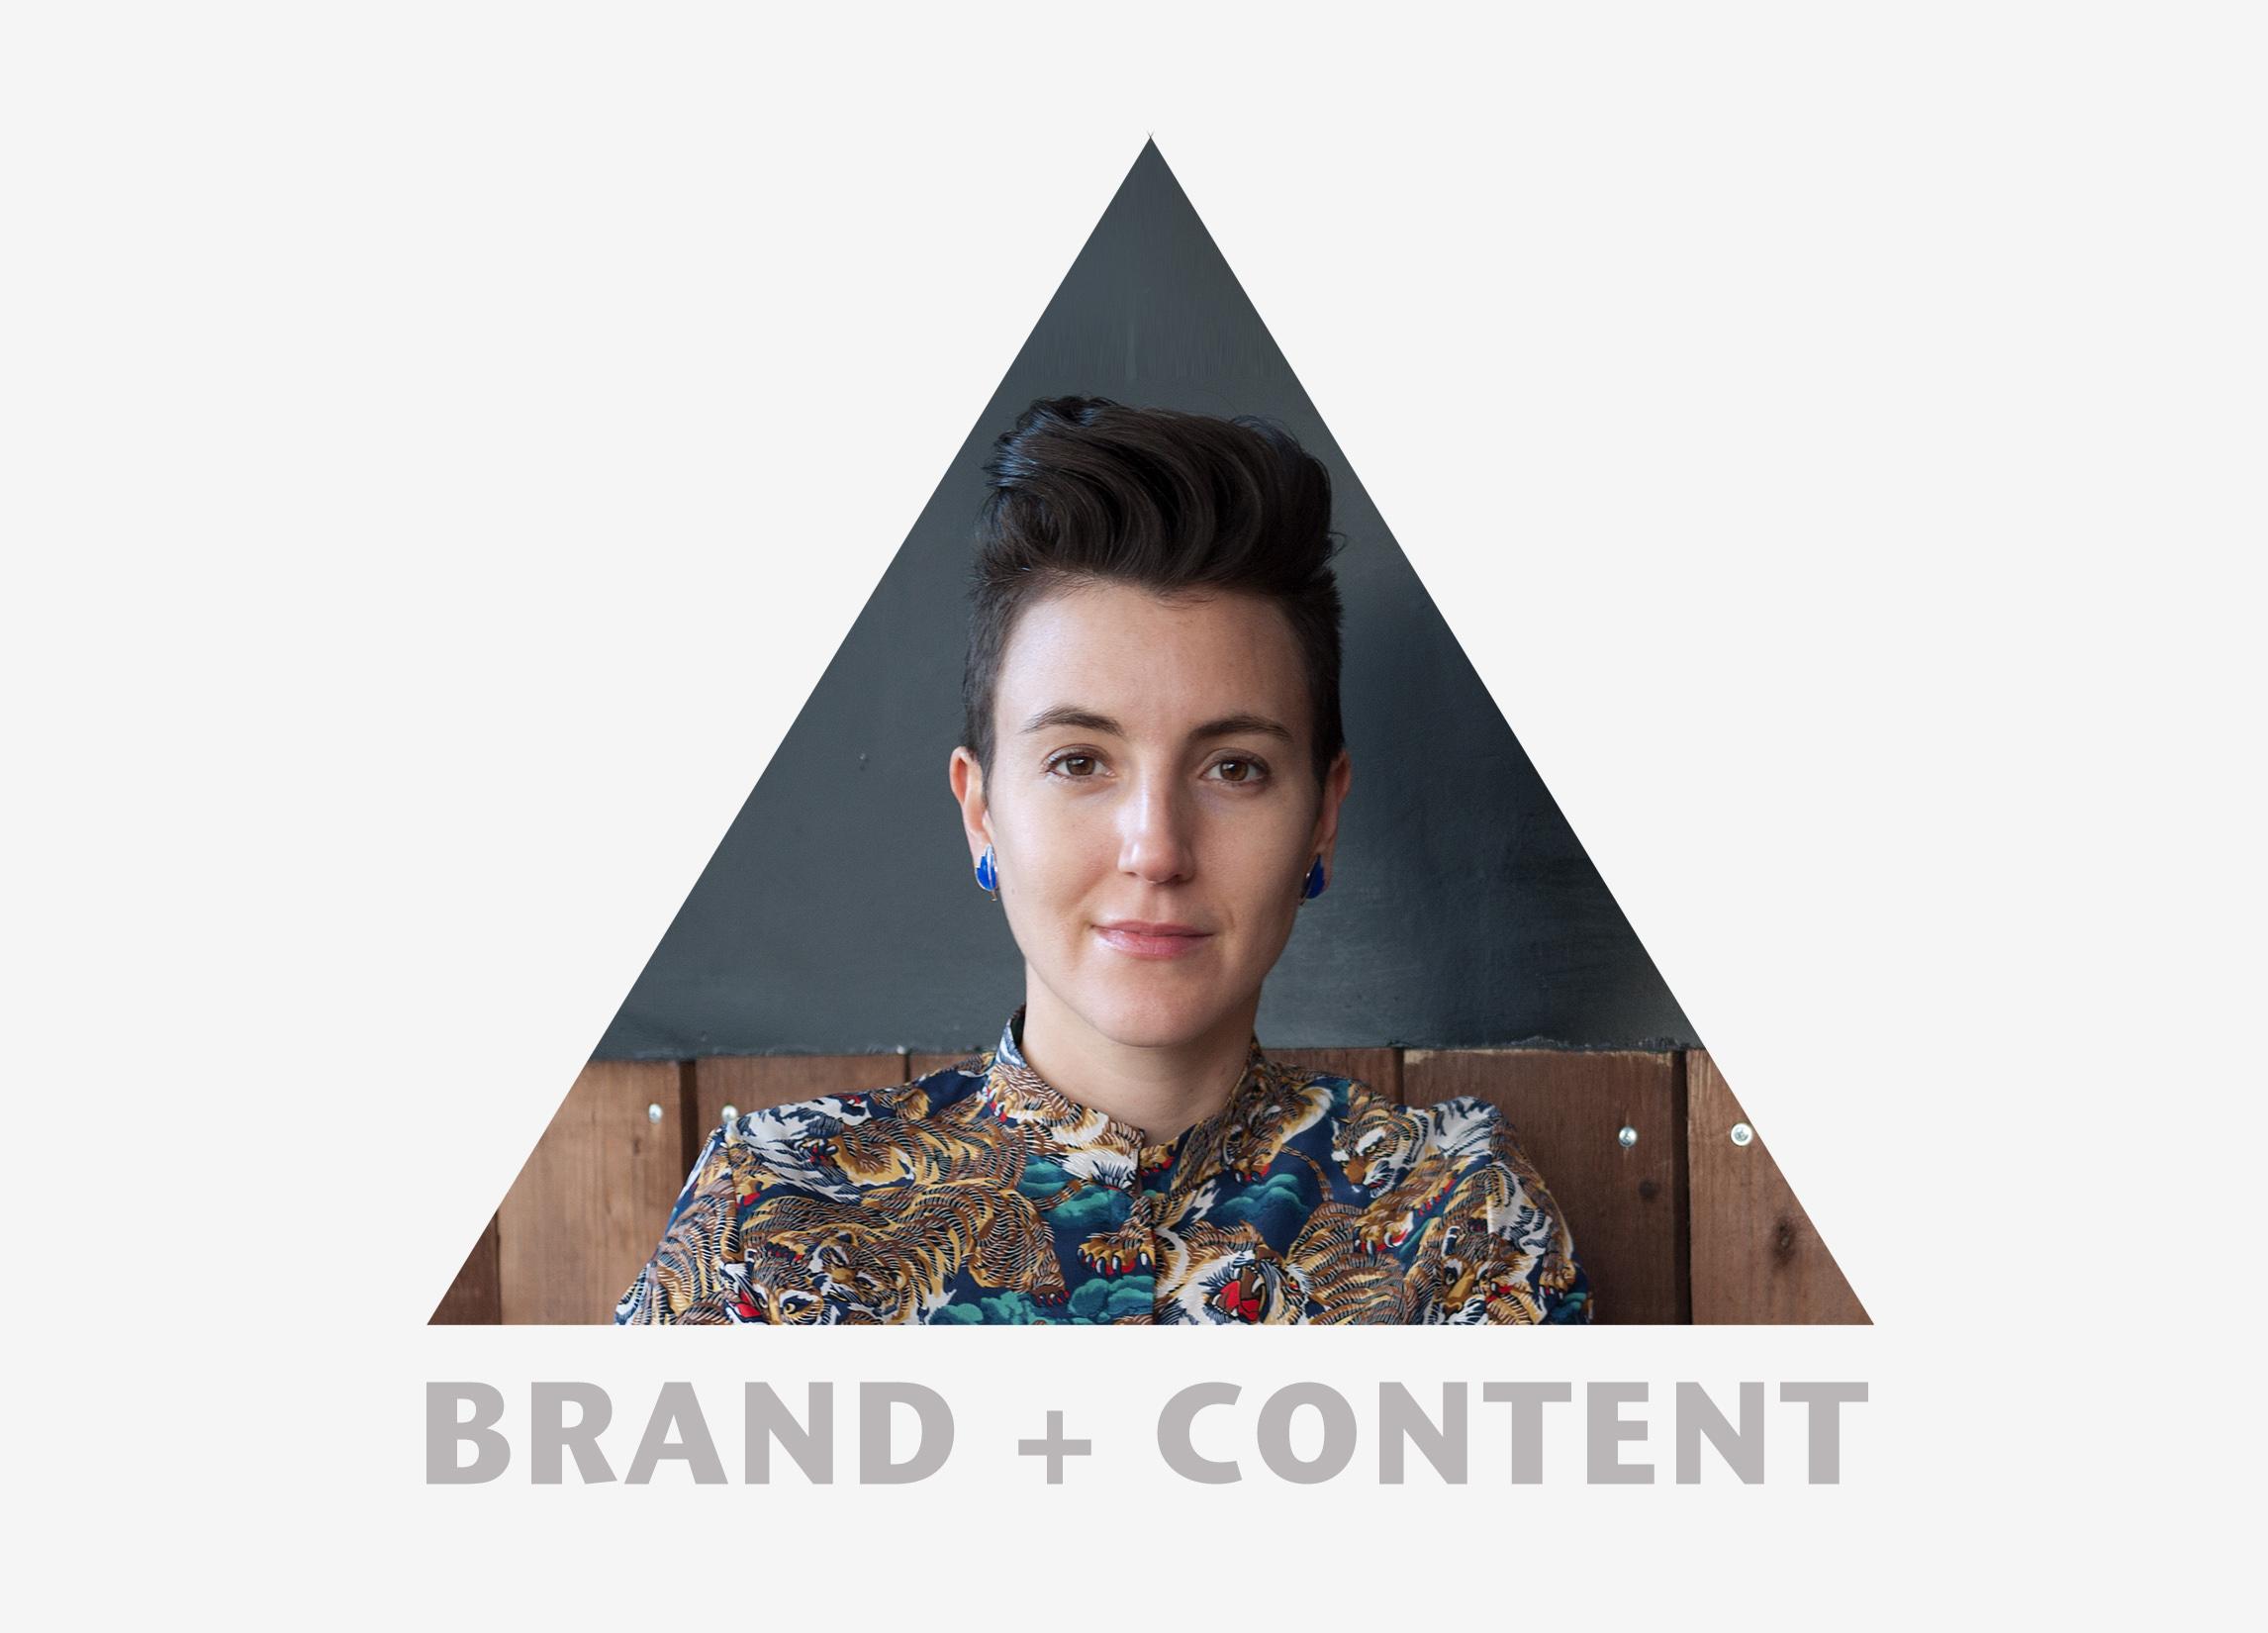 Brand + Content